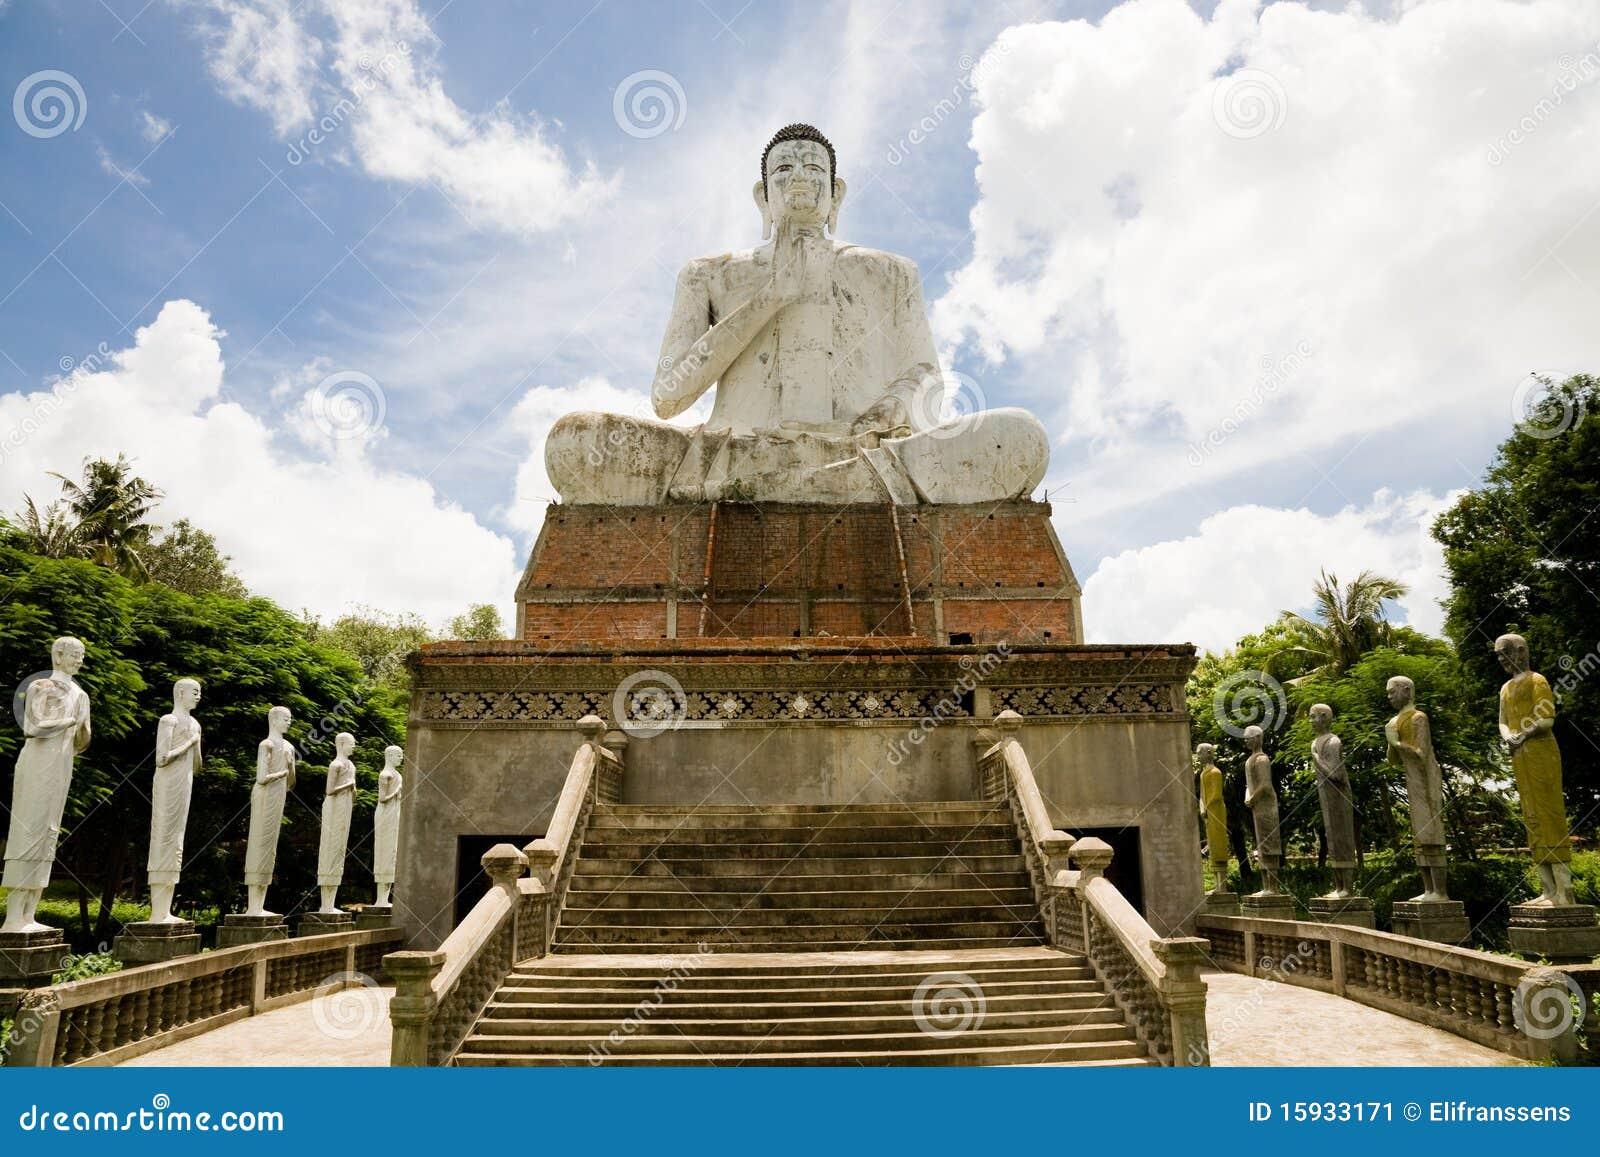 Giant Buddha, Battambang, Cambodia Stock Image